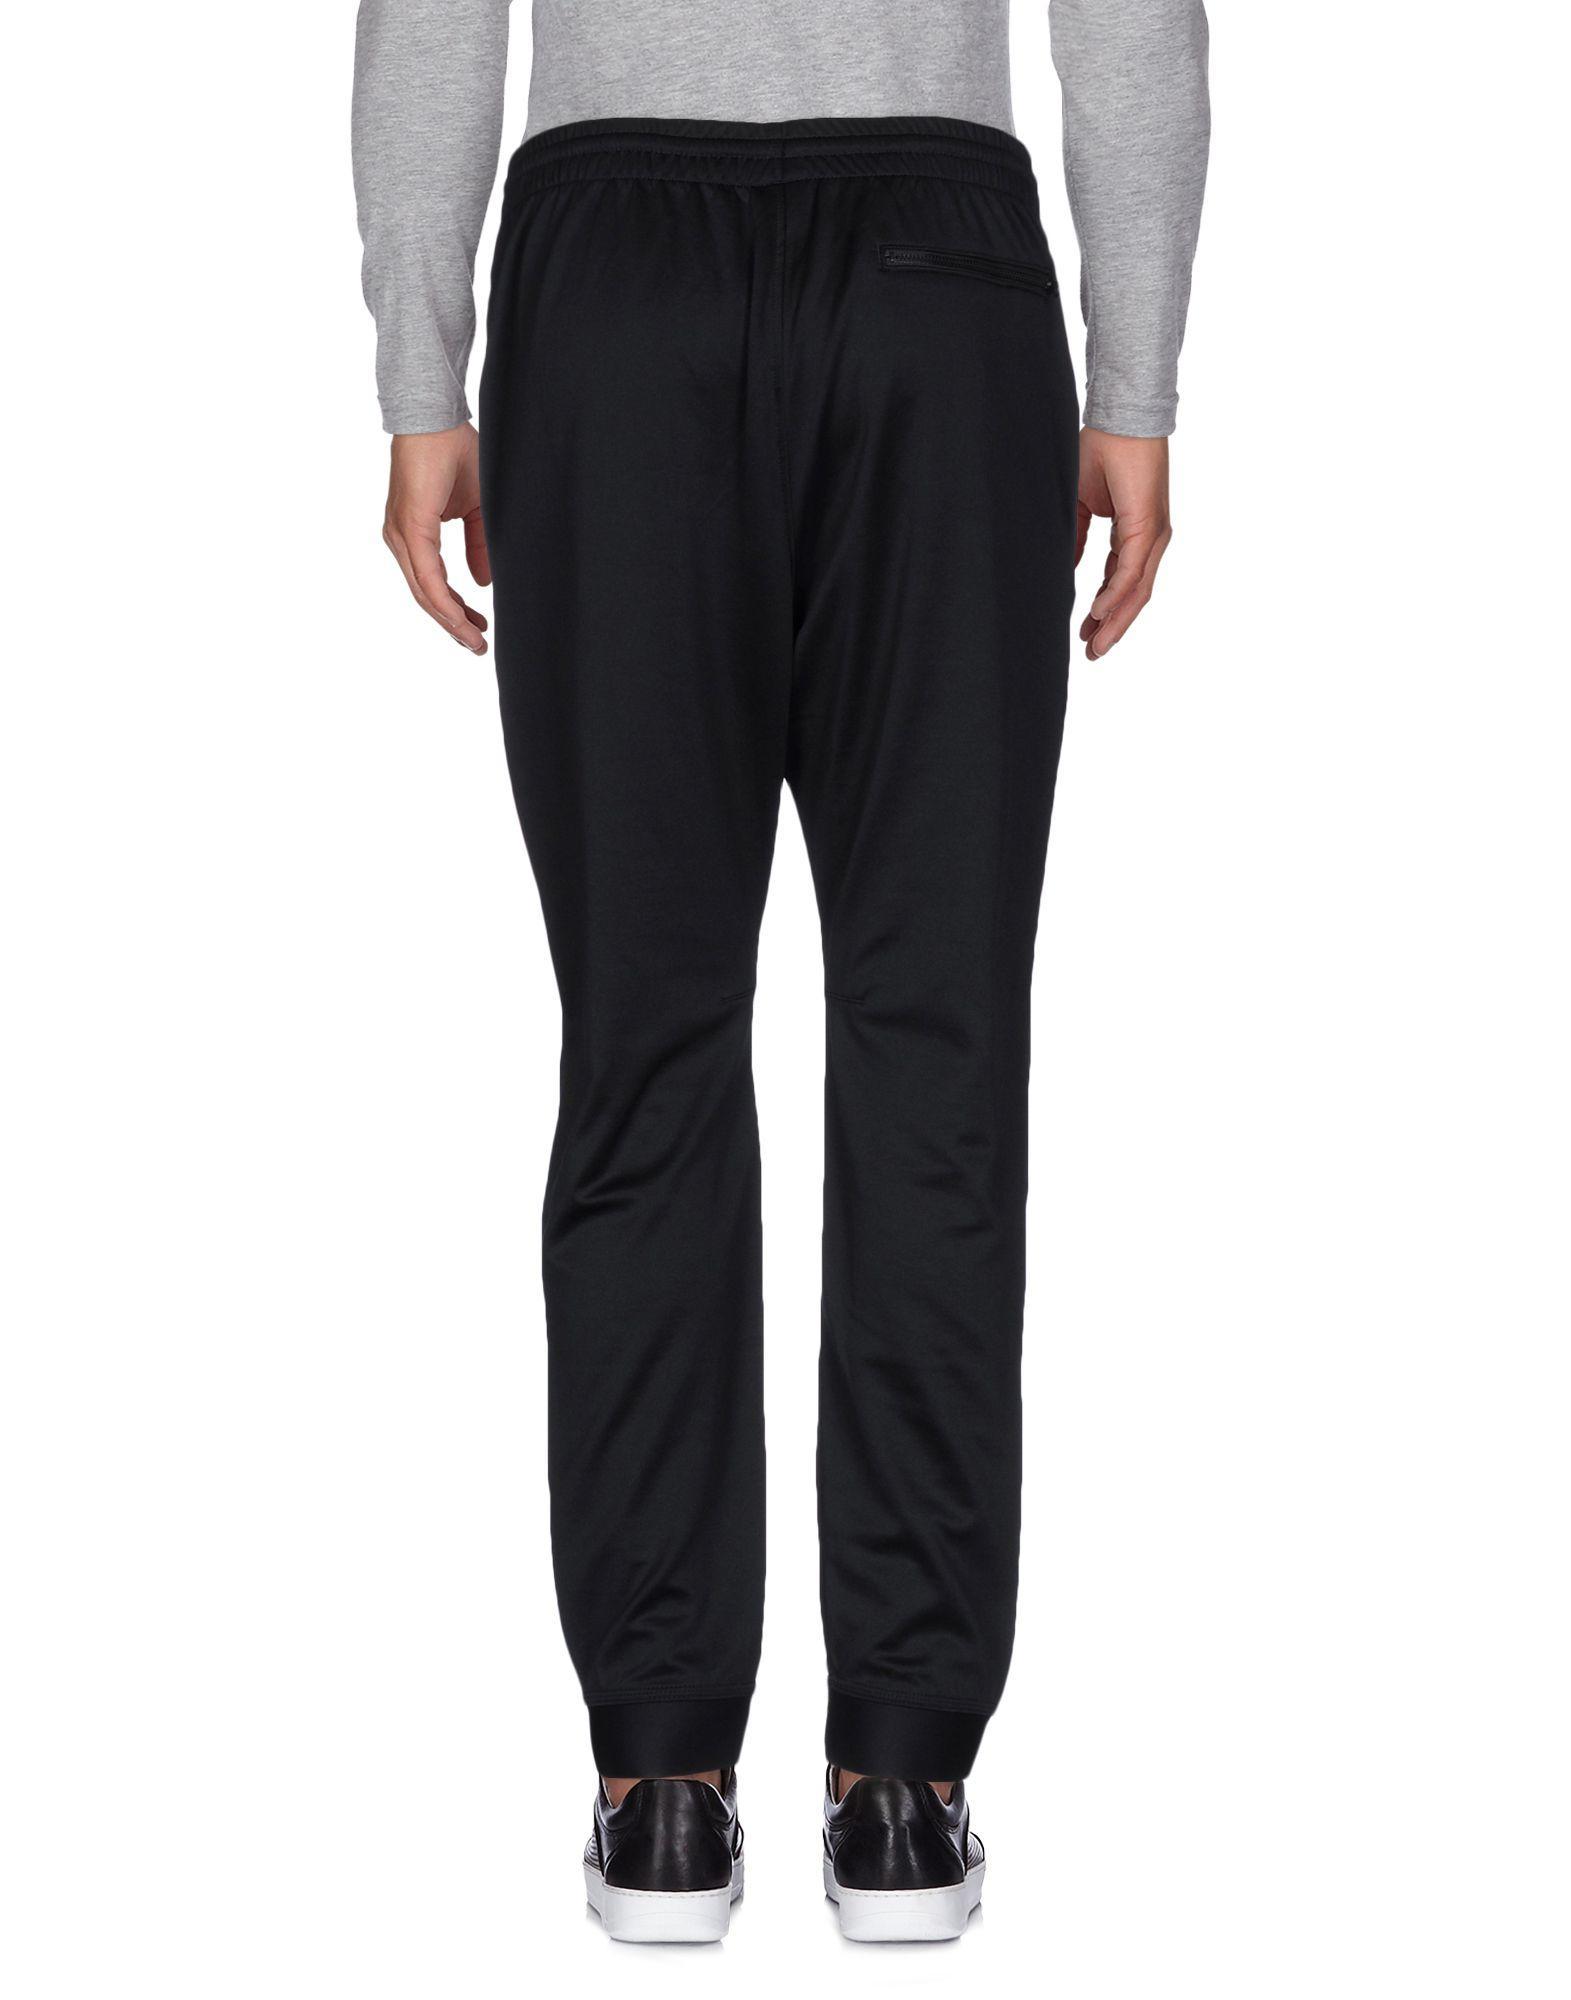 Nike Casual Pants in Black for Men - Lyst